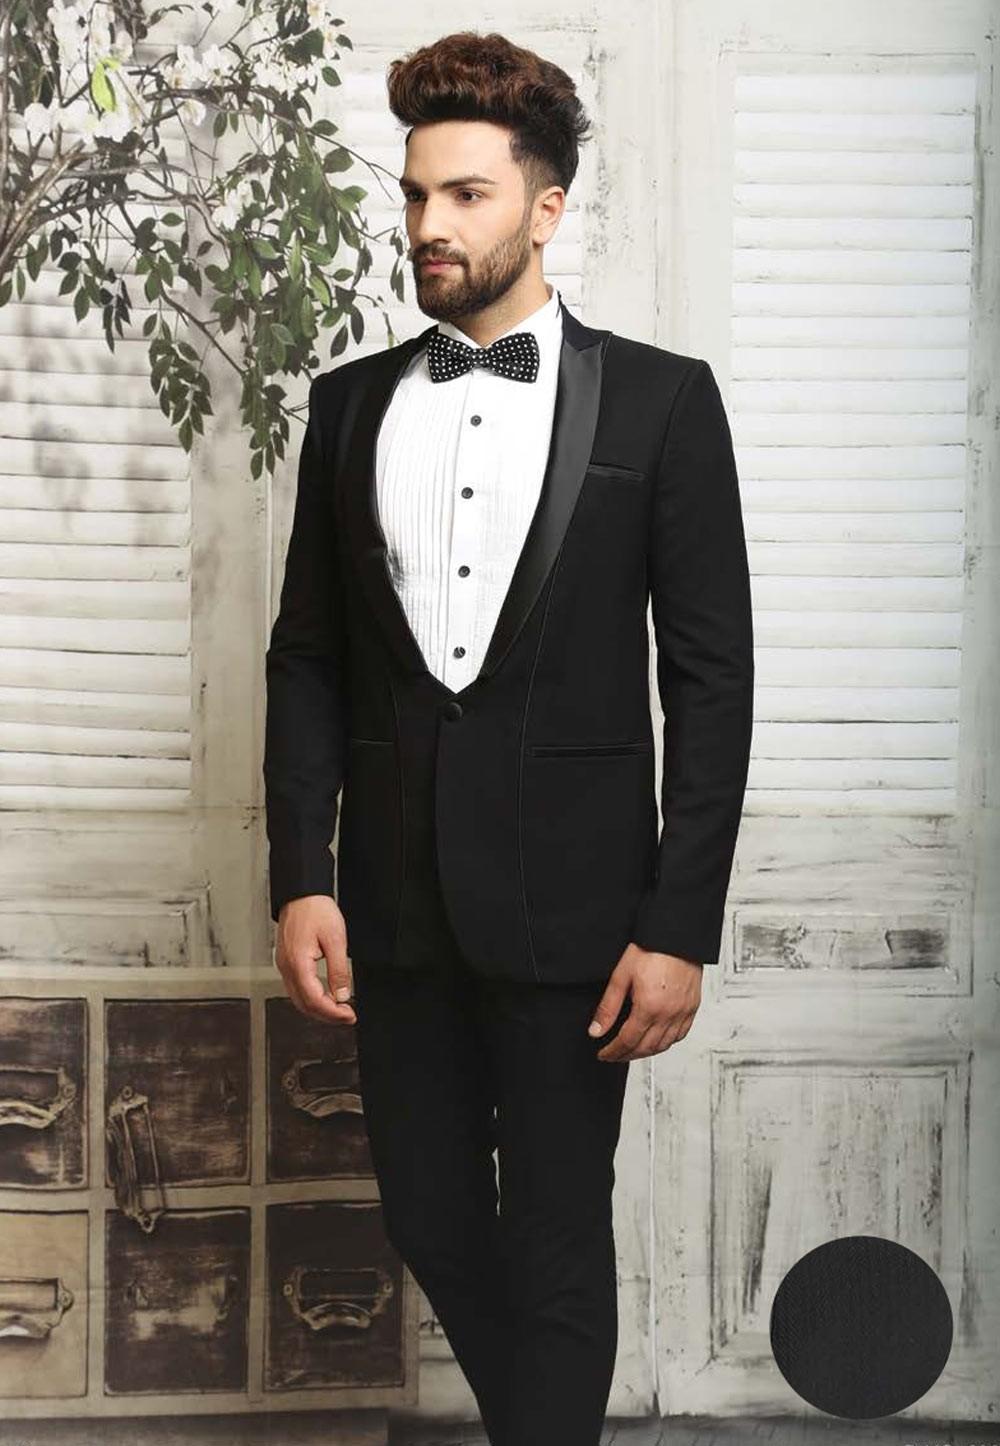 Buy Black Color Italian Fabric Tuxedo Suits Online